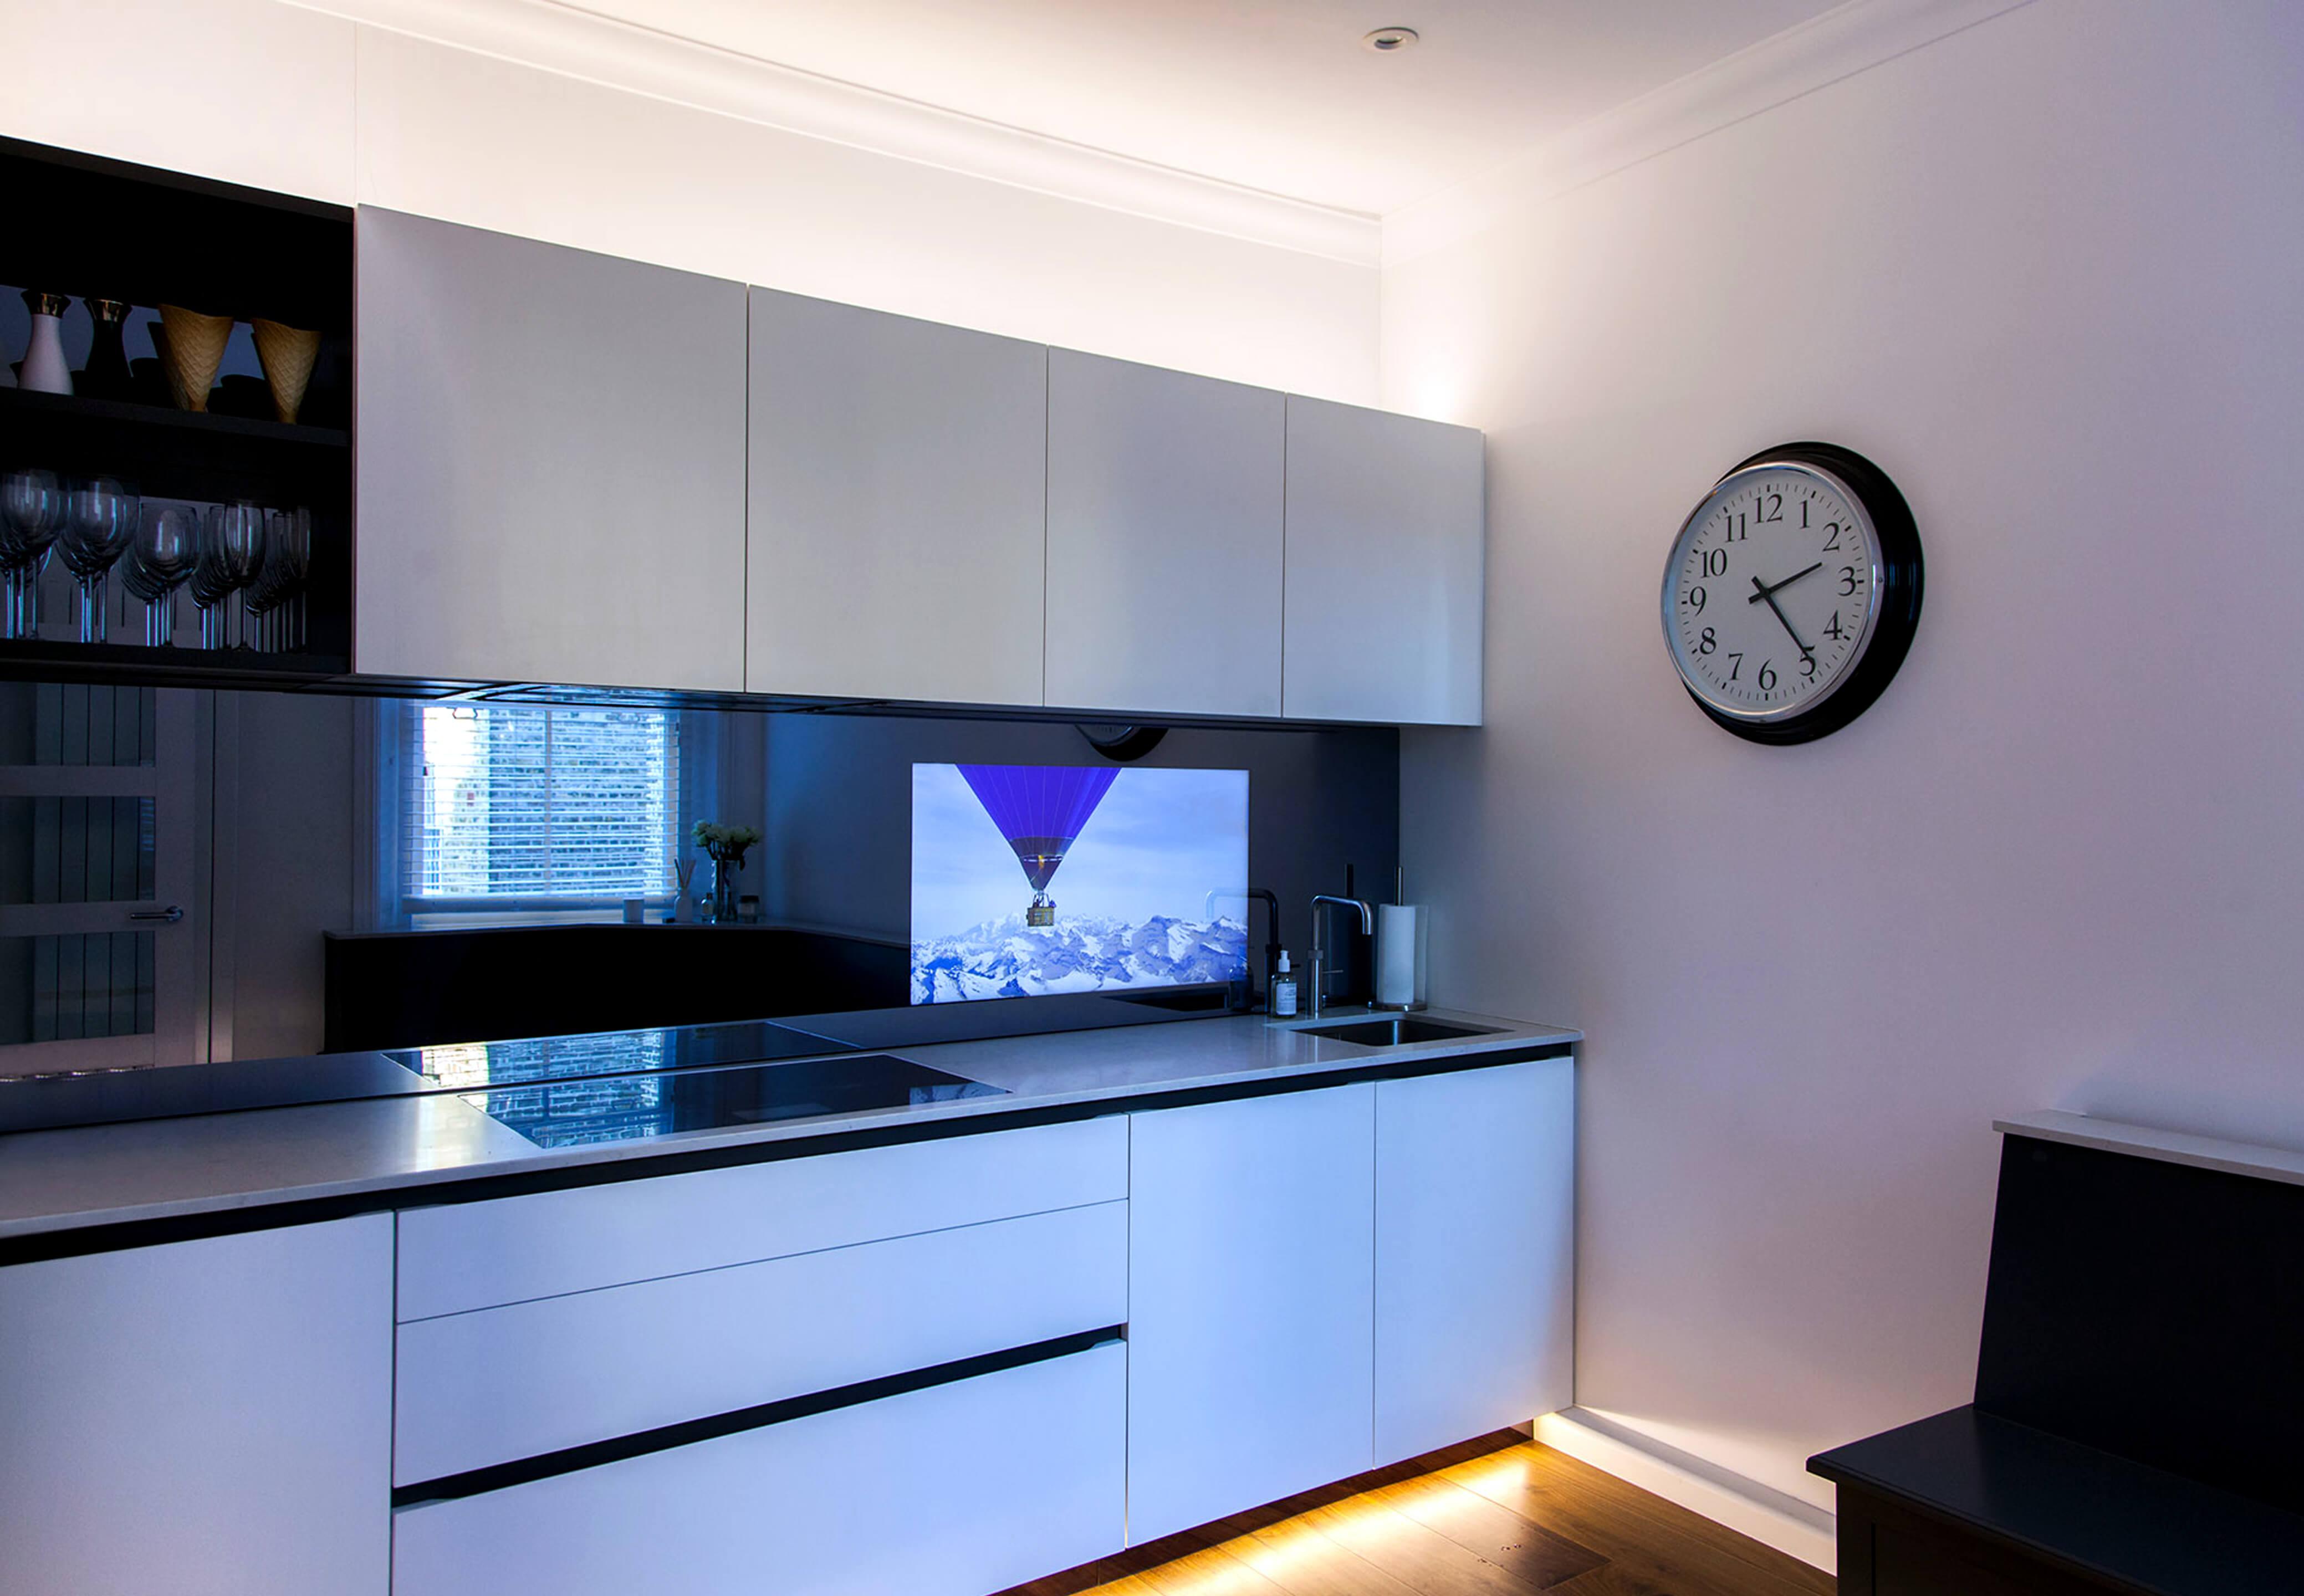 телевизор на кухню в кухонный фартук